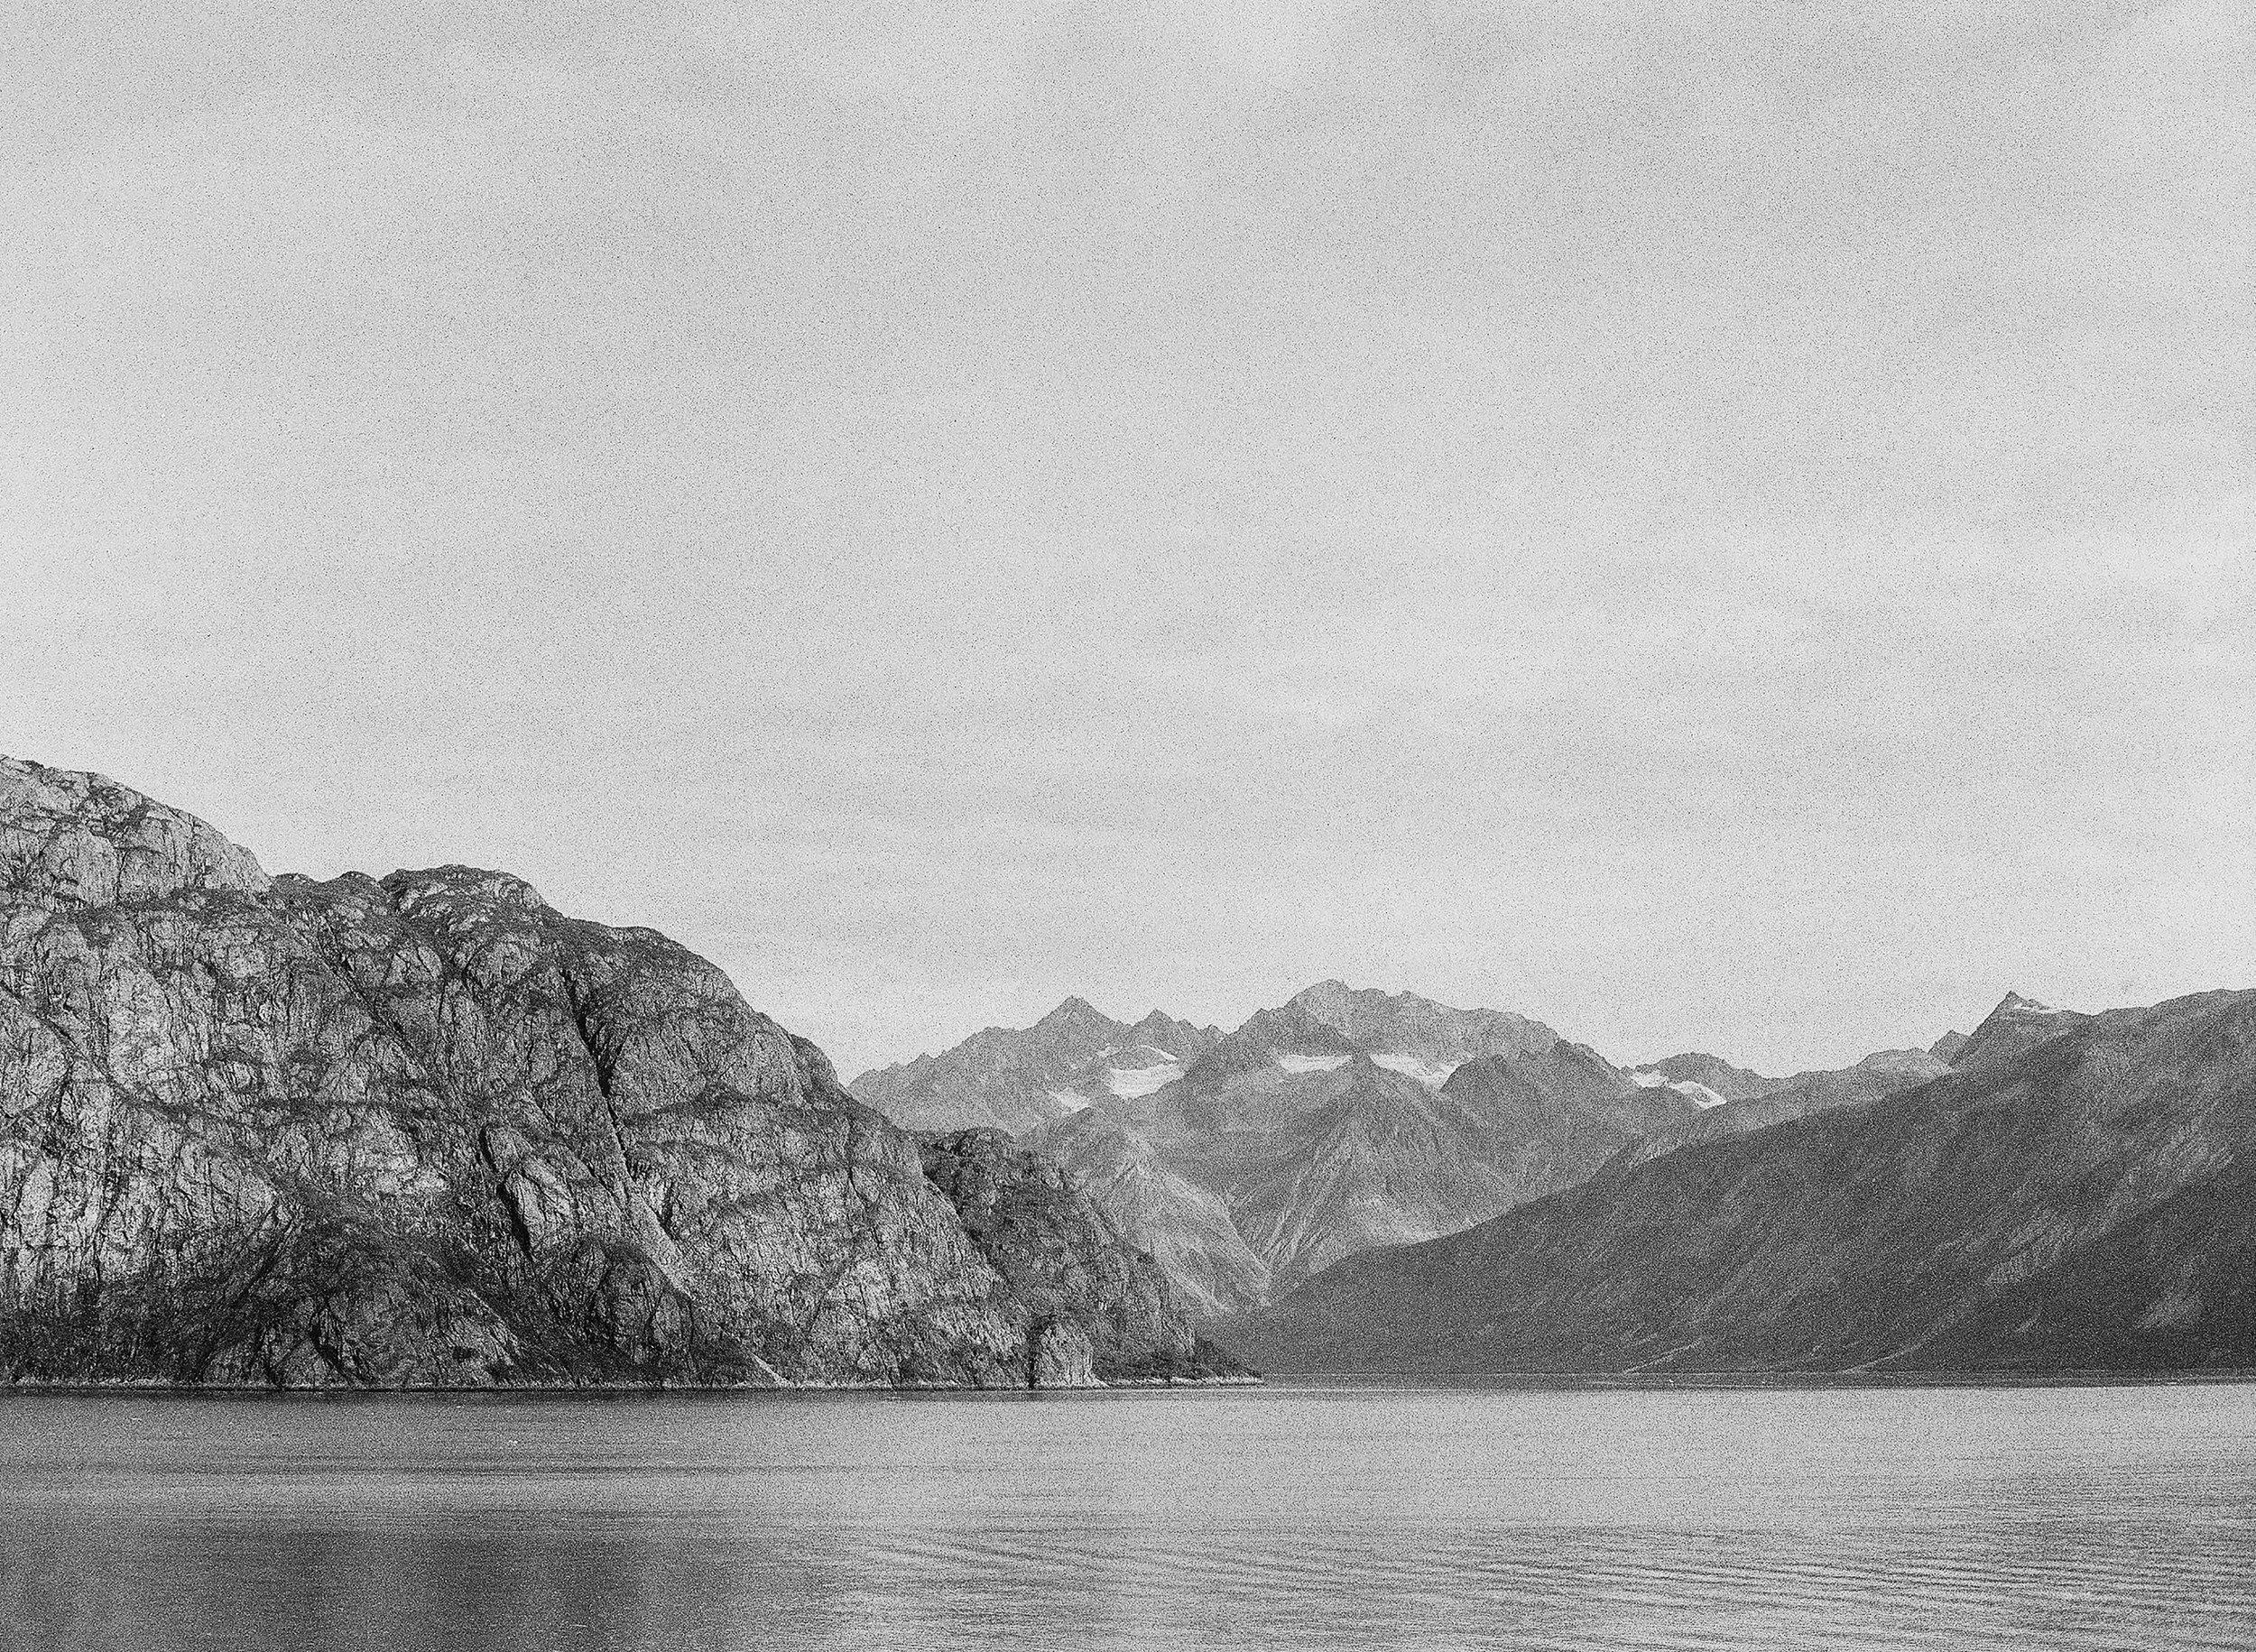 Alaska-Cruise-275-Jen_Huang-000001250006.jpg